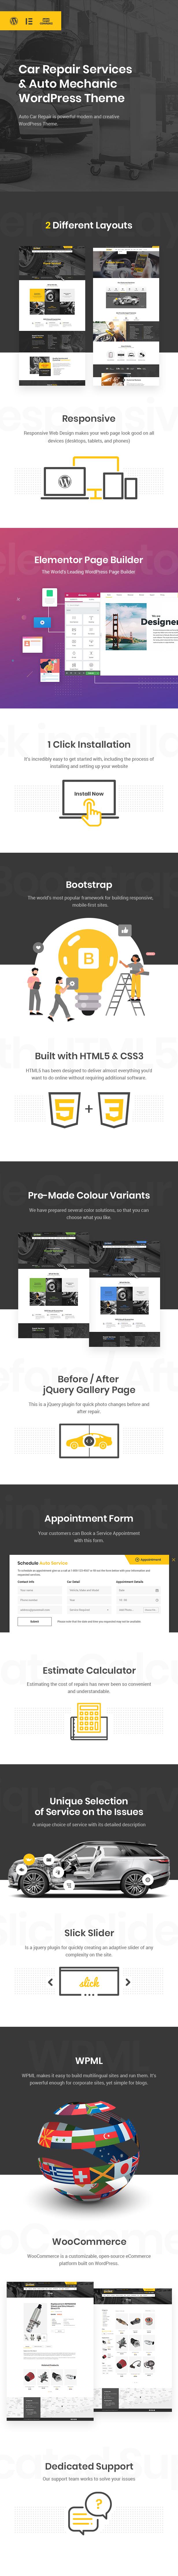 Car Repair Services & Auto Mechanic WordPress Theme - 4